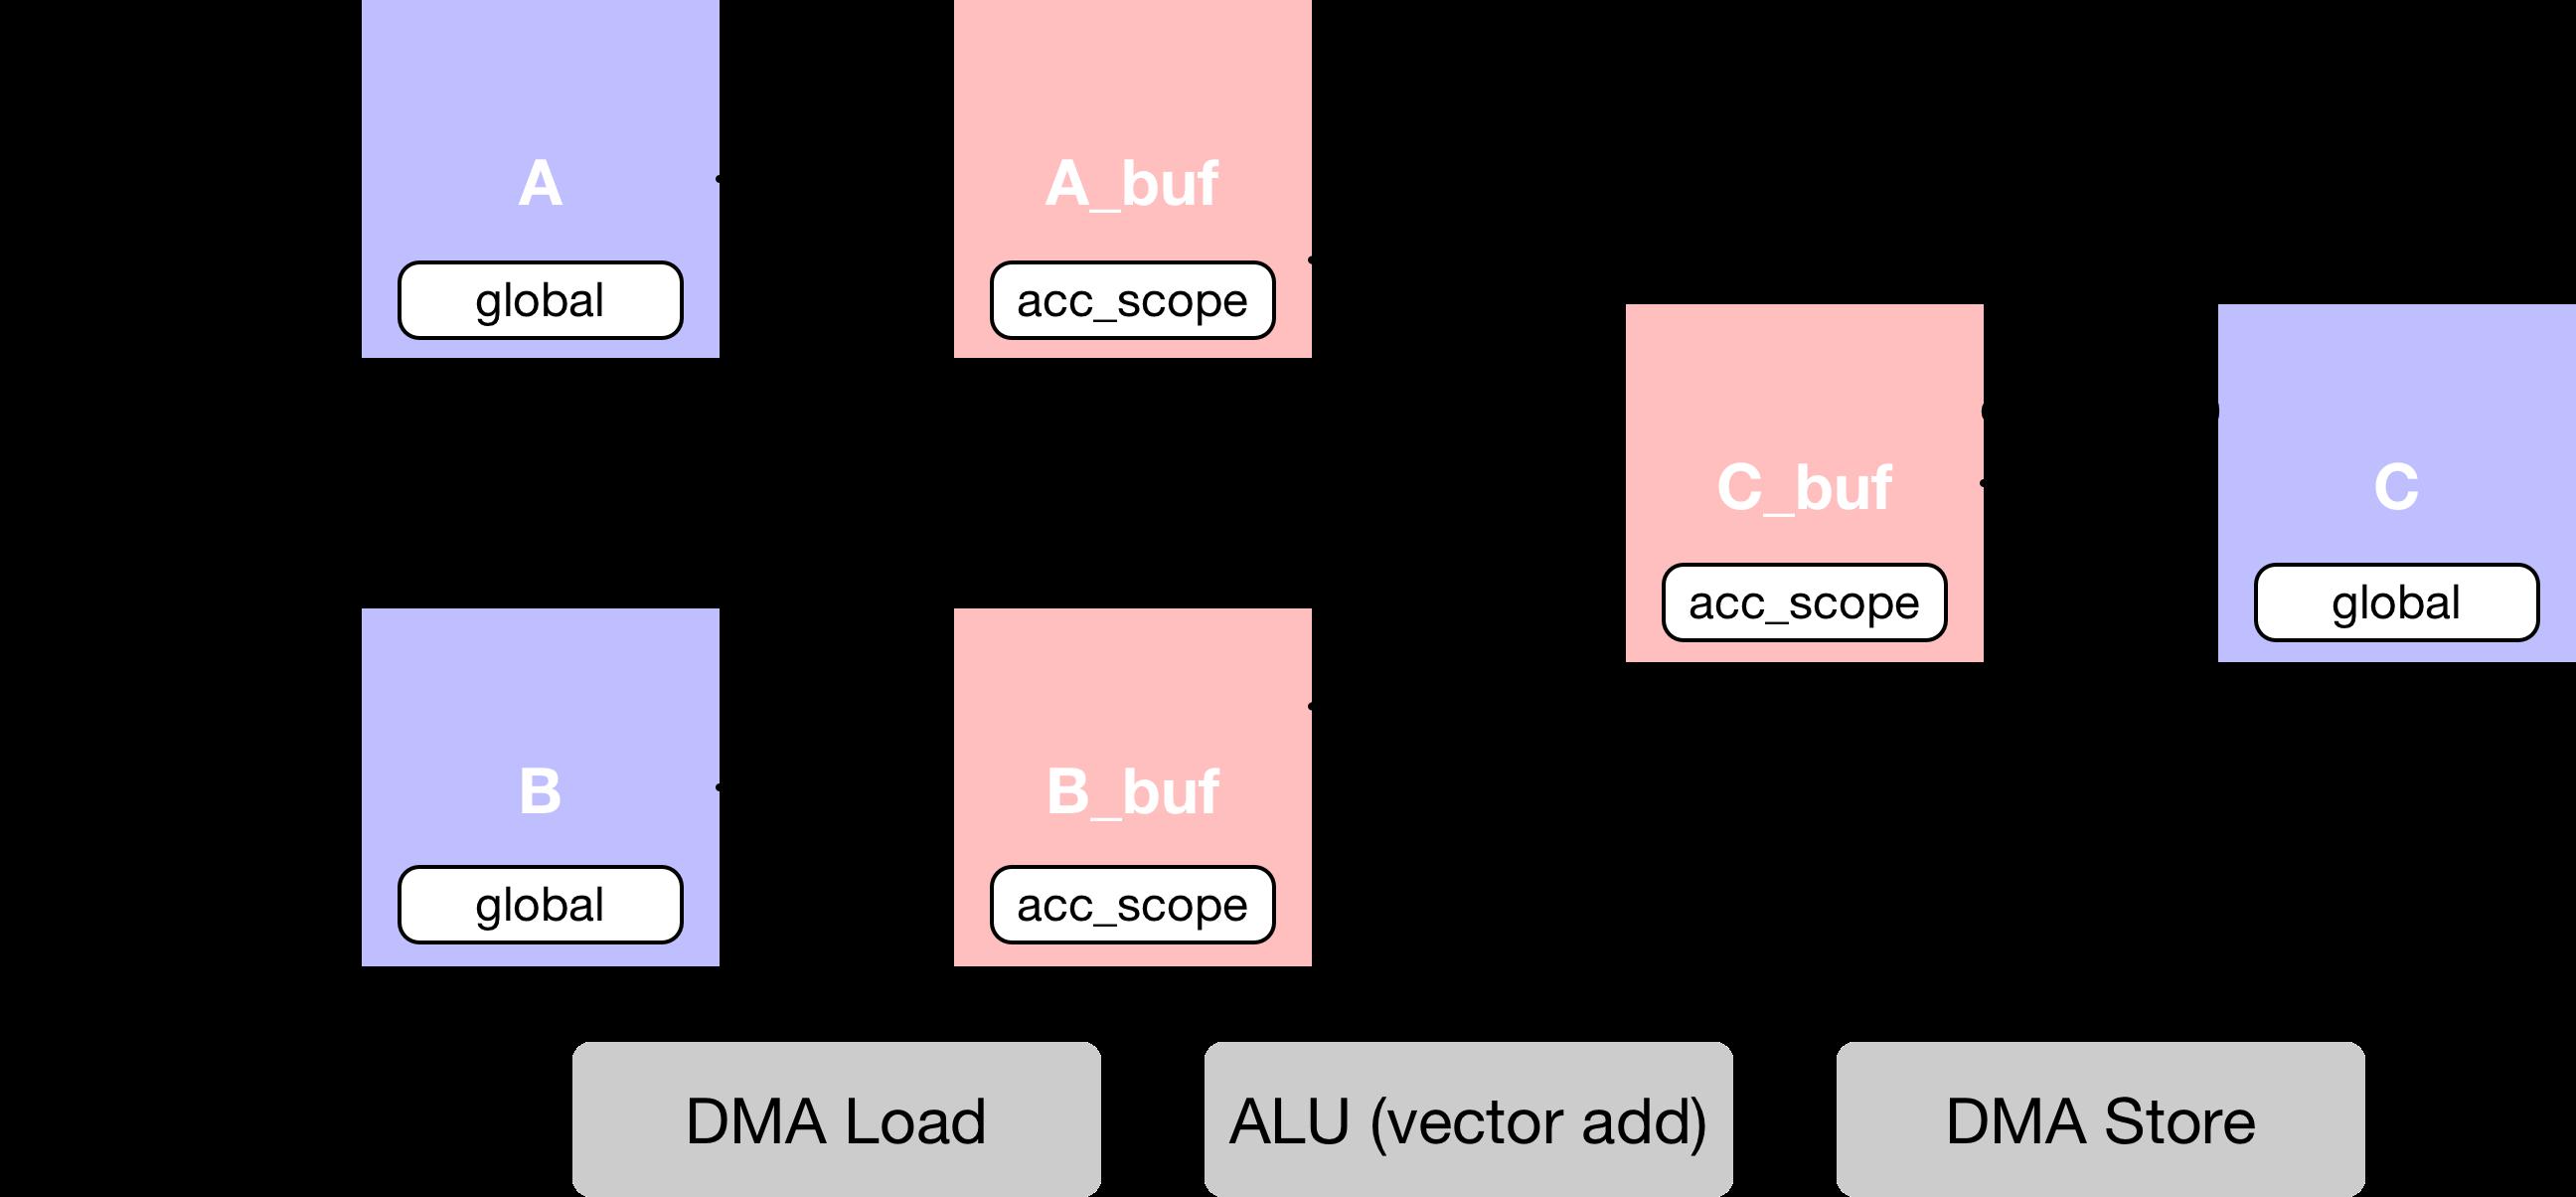 https://raw.githubusercontent.com/uwsampl/web-data/main/vta/tutorial/vadd_dataflow.png